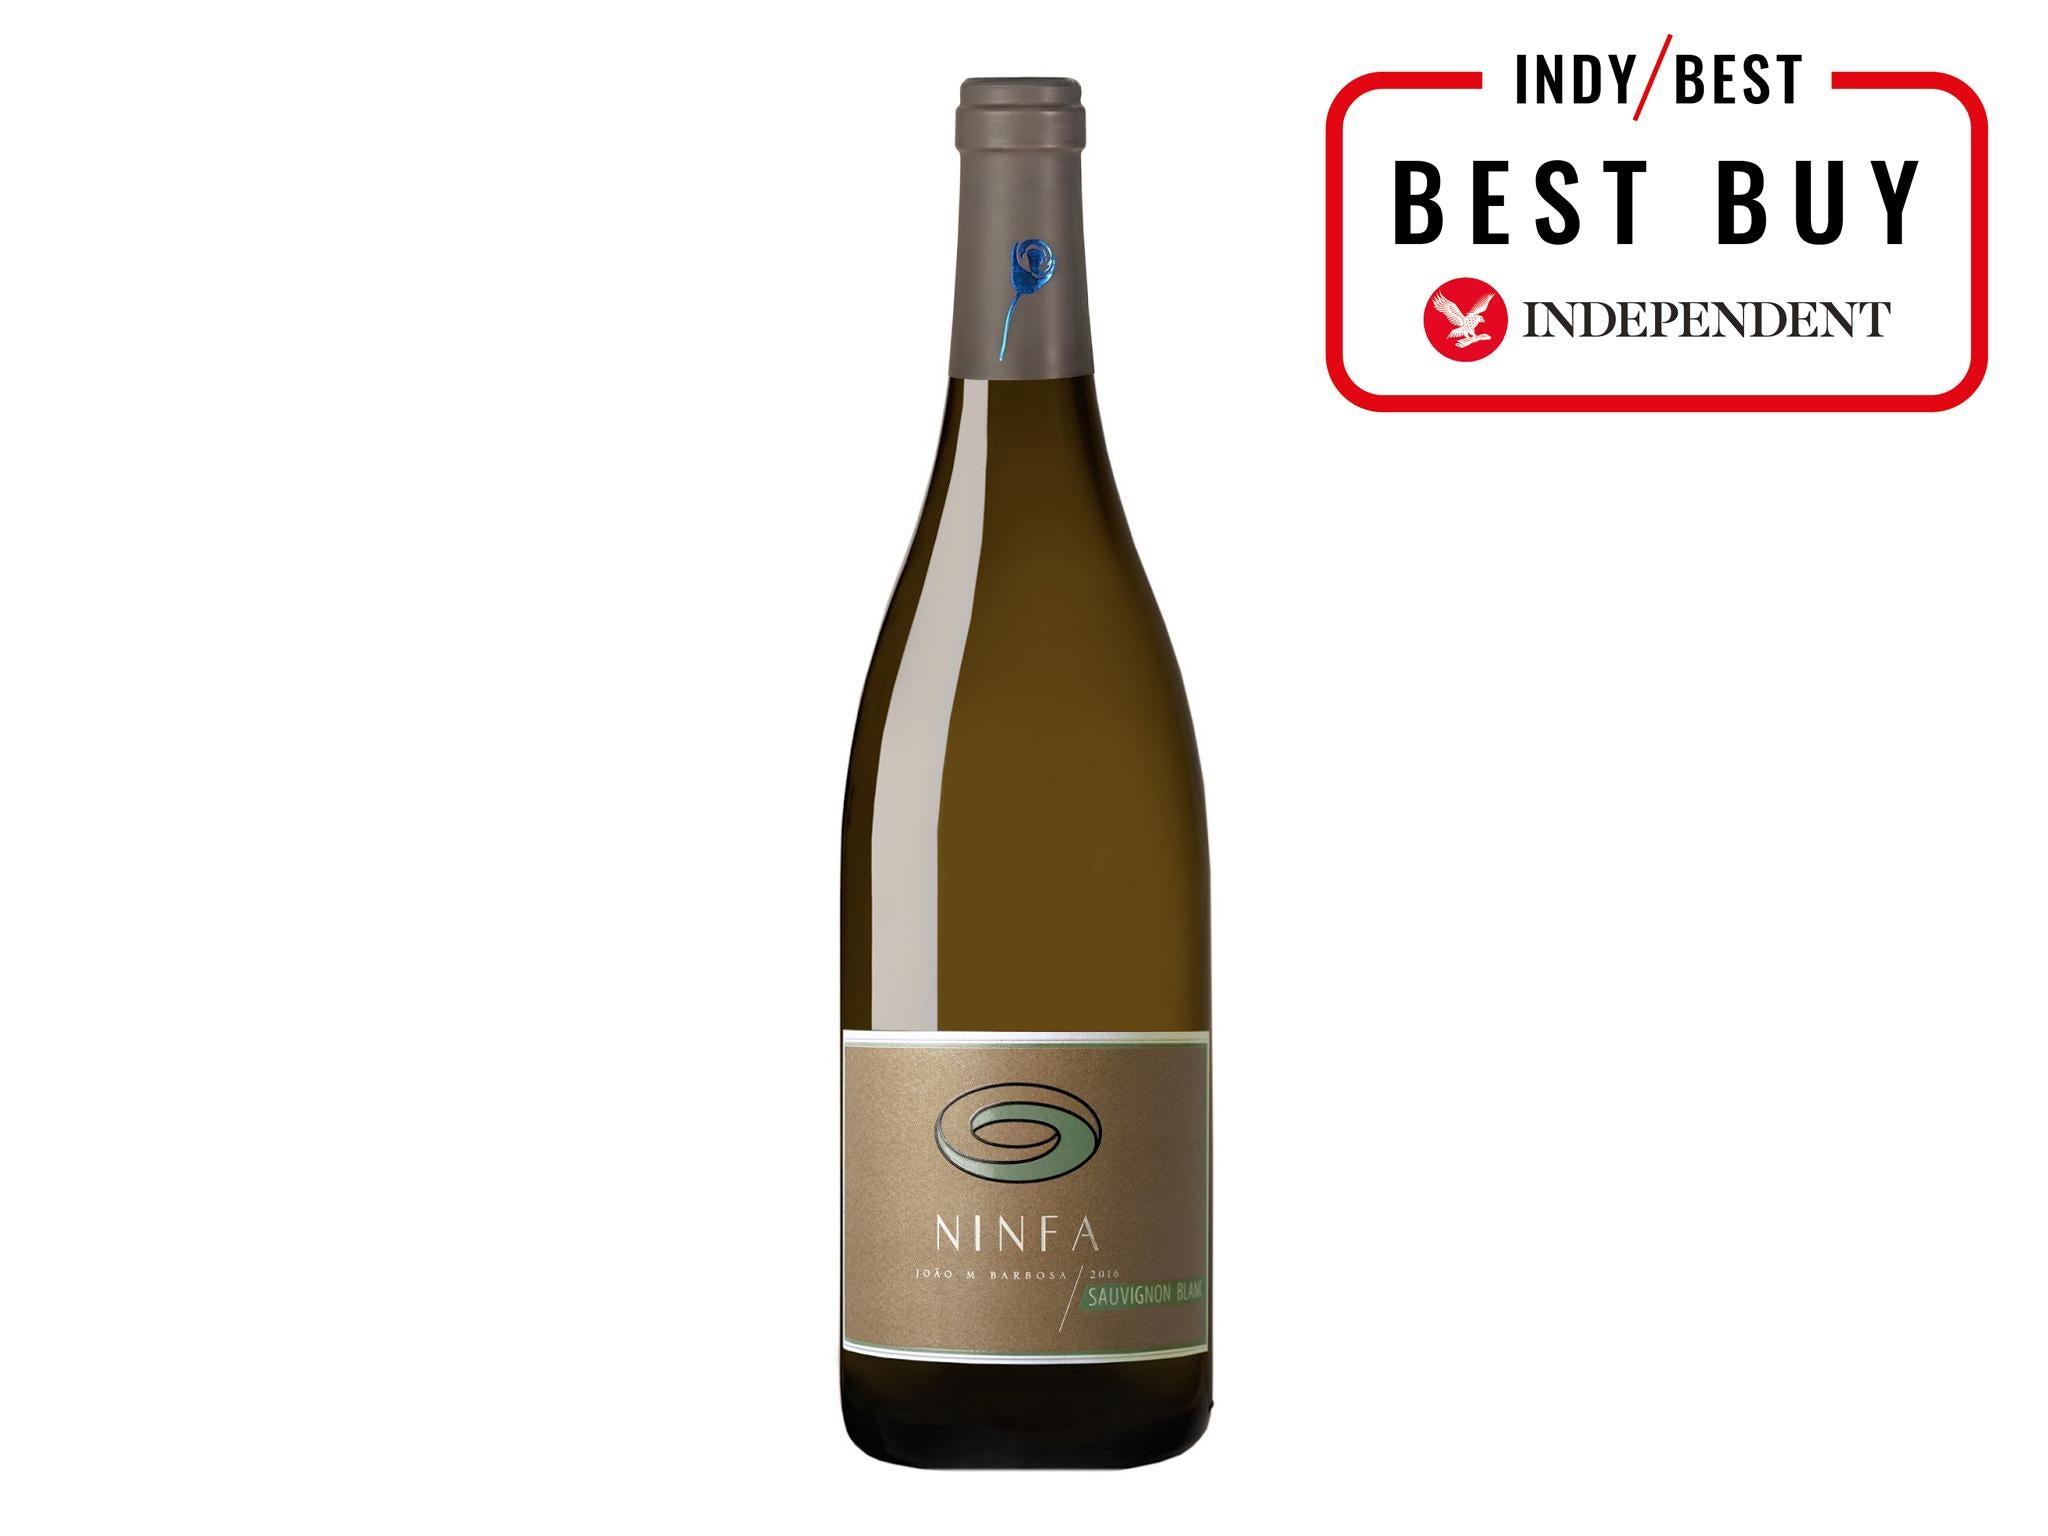 15 Best Sauvignon Blanc Wines The Independent